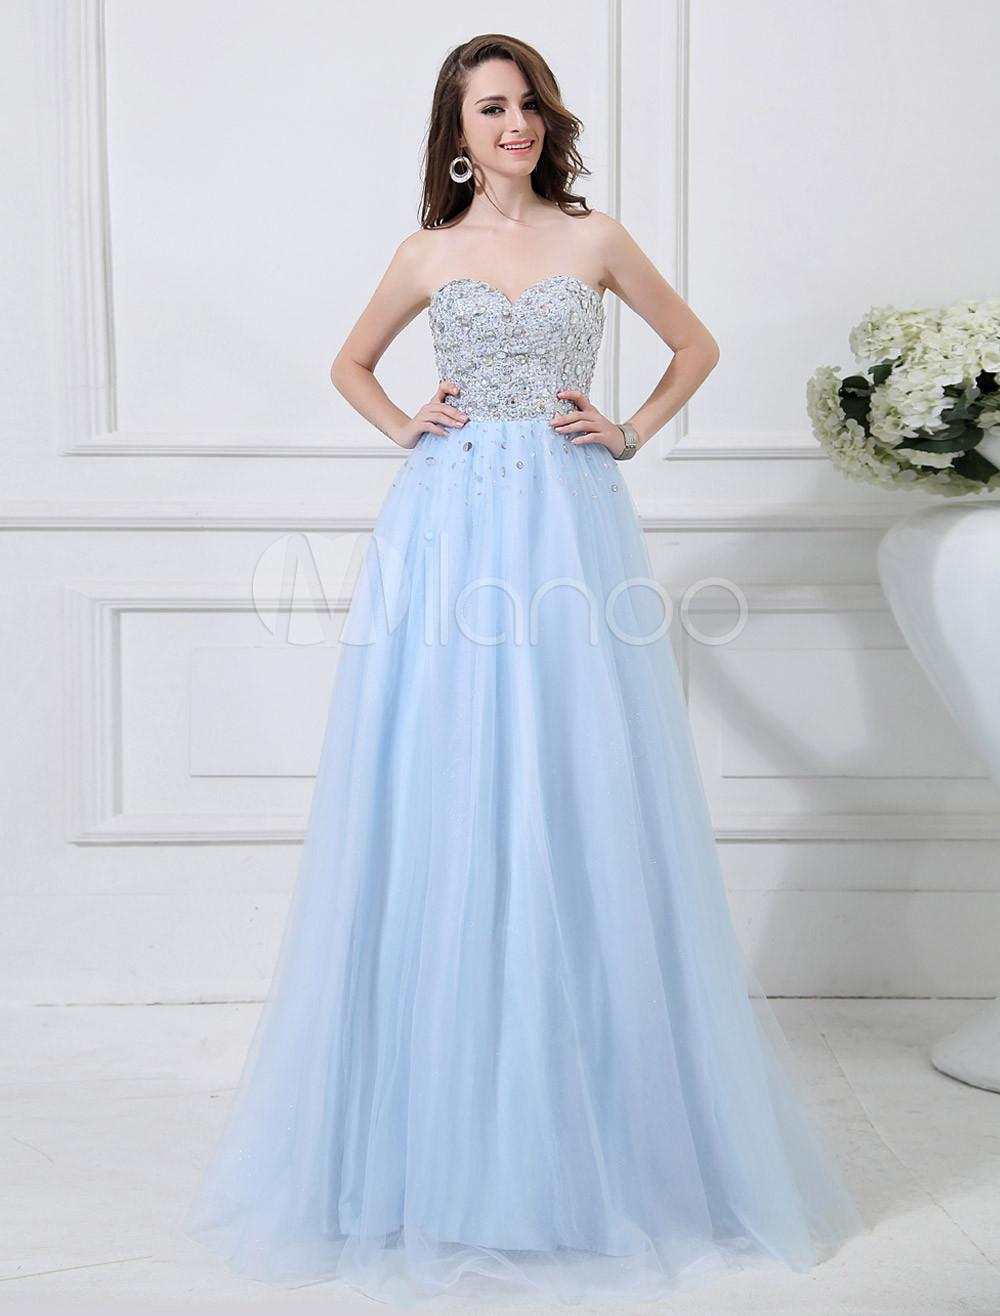 Light Blue Sweetheart Neck Tulle Prom Dress (Wedding Prom Dresses) photo